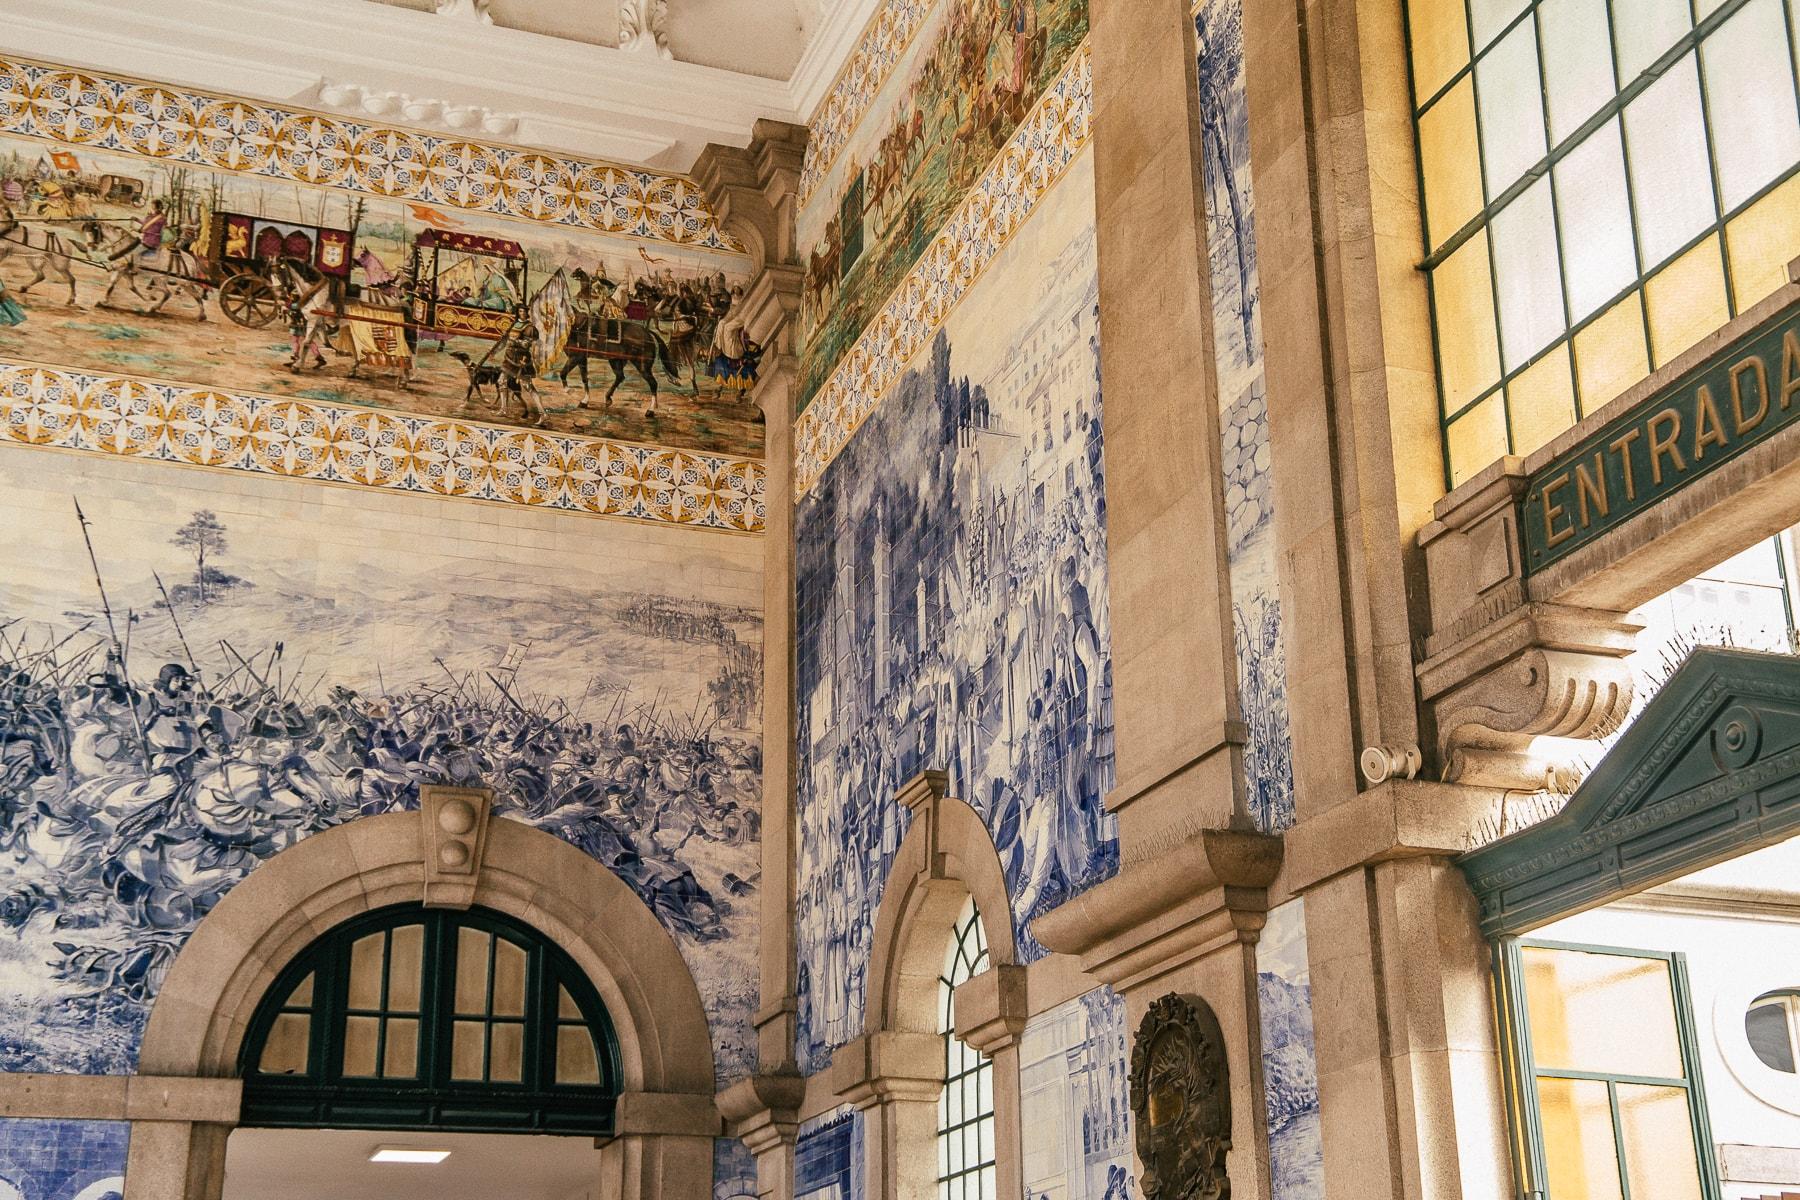 zehn-porto-tipps-fuer-deine-staedtereise-in-portugal-reiseblog-des-belles-choses 8